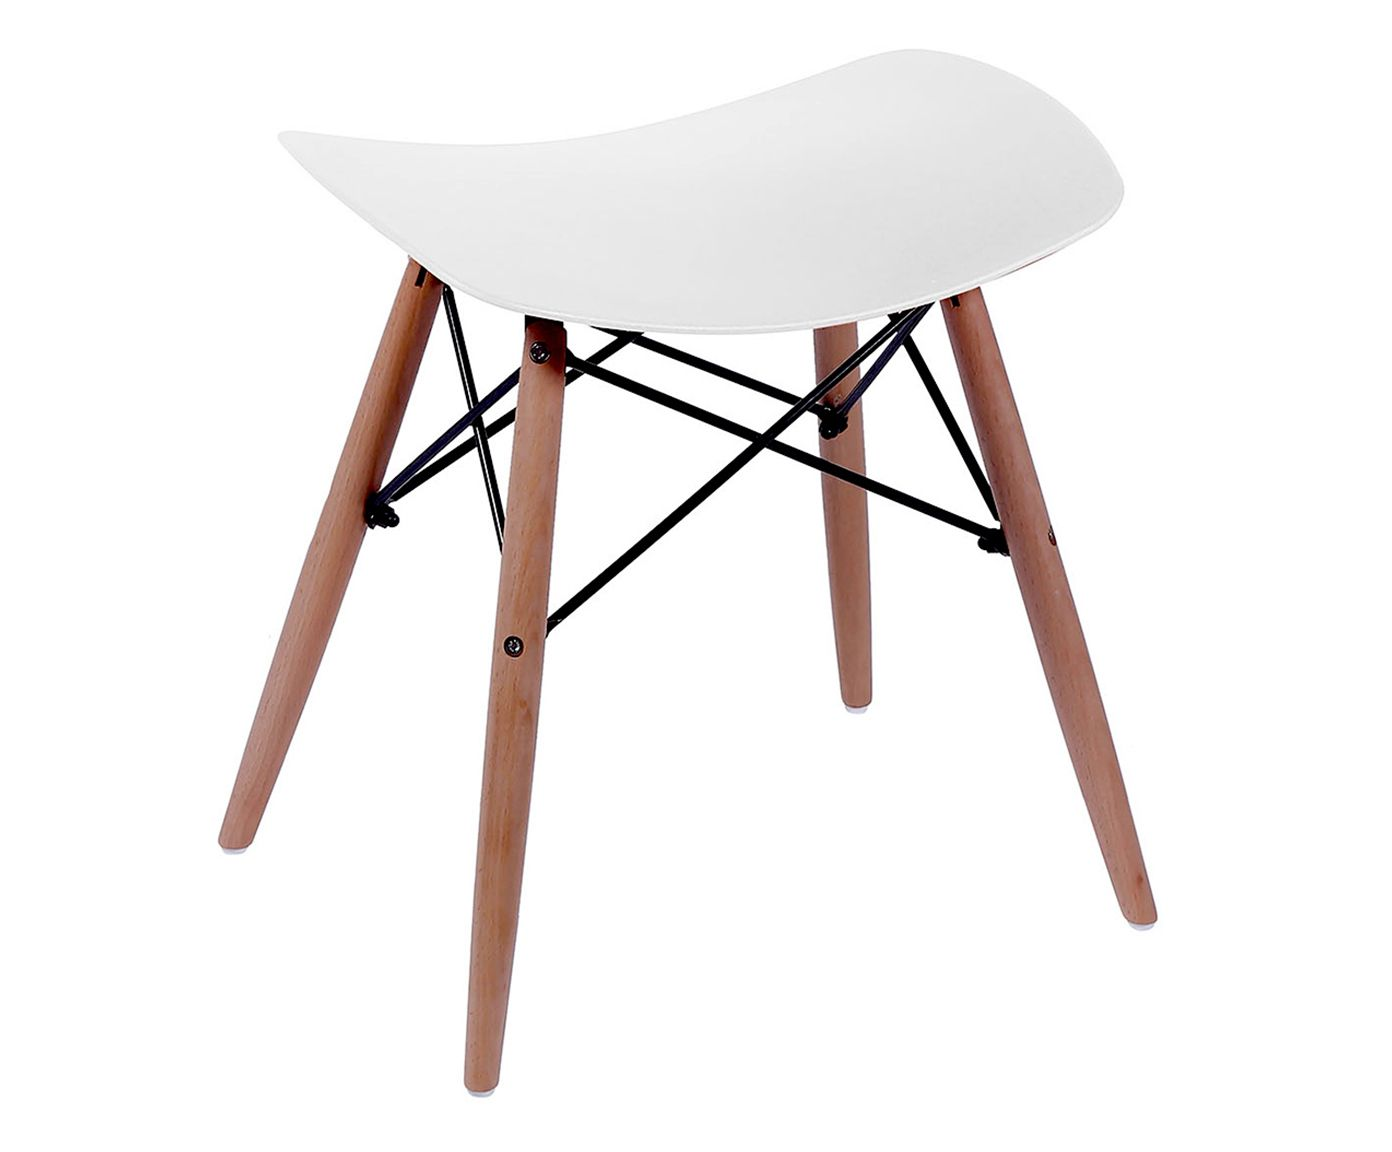 Banquinho Eames Wood Branco - 49X47cm | Westwing.com.br